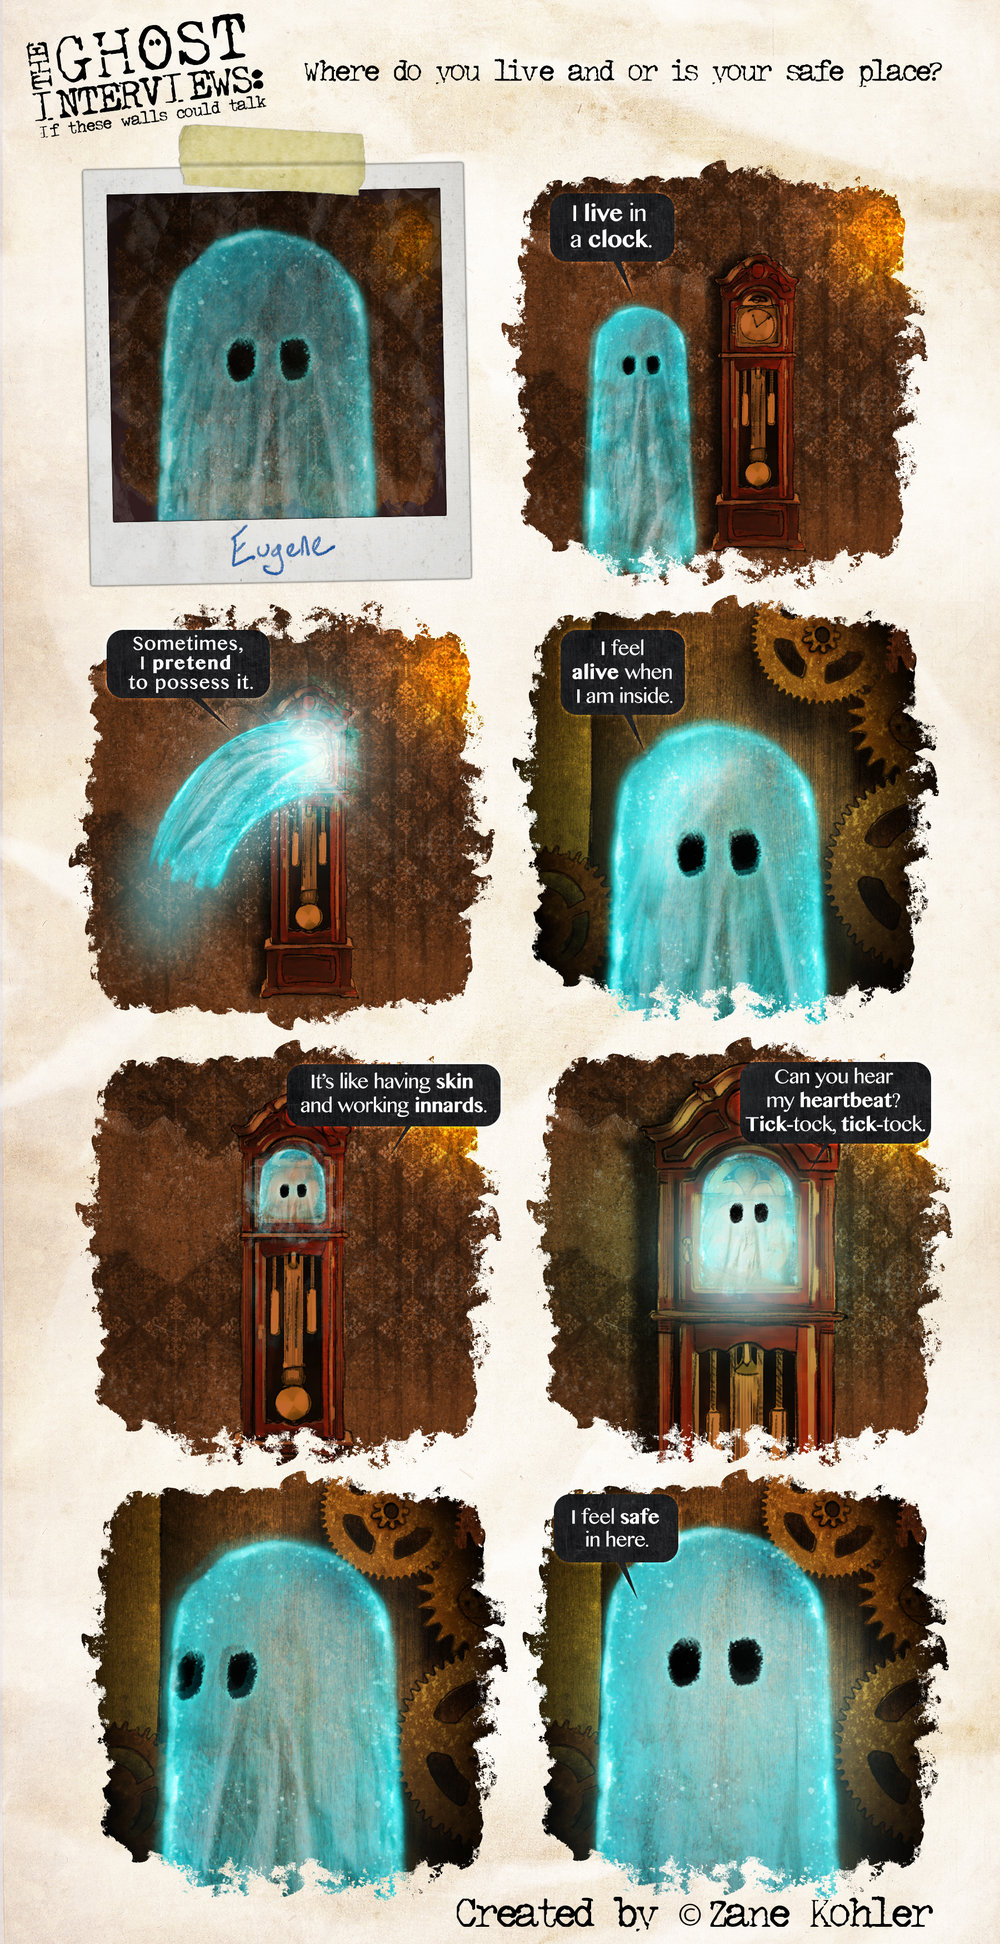 ghosts-interview-1b.jpg